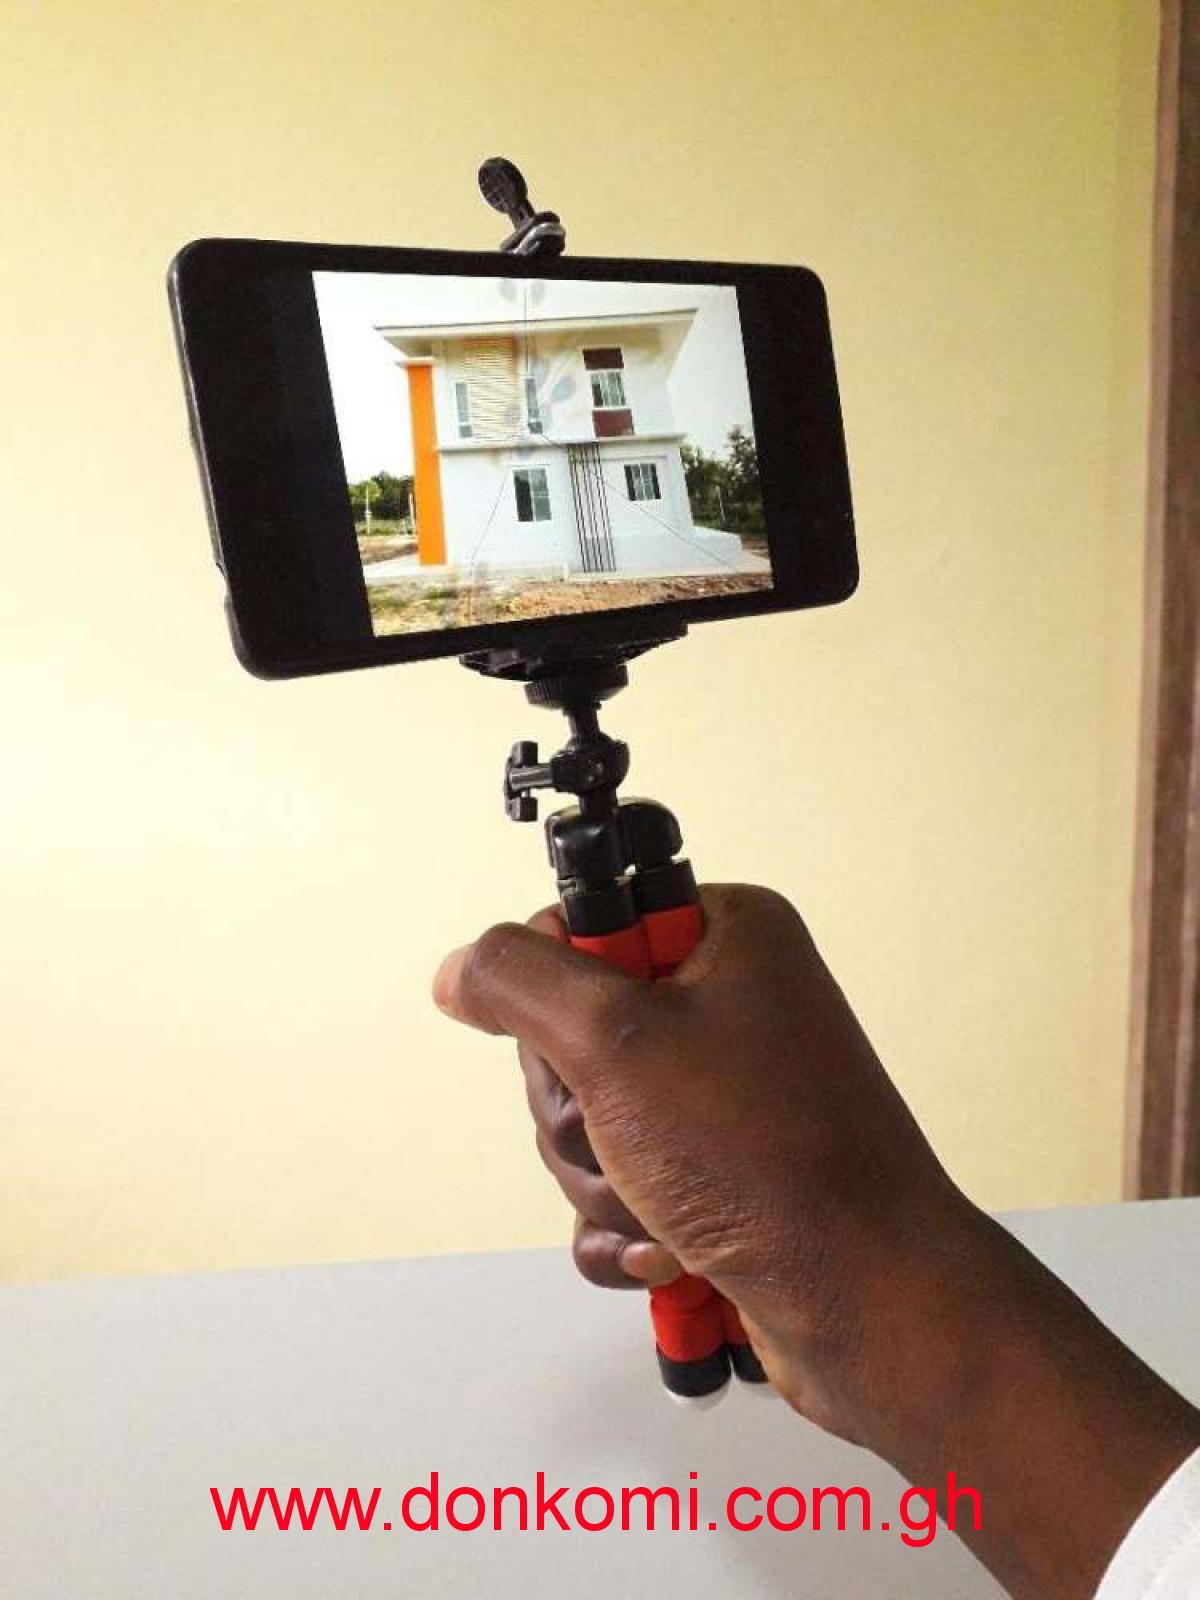 Flexi tripod for phones and Cameras